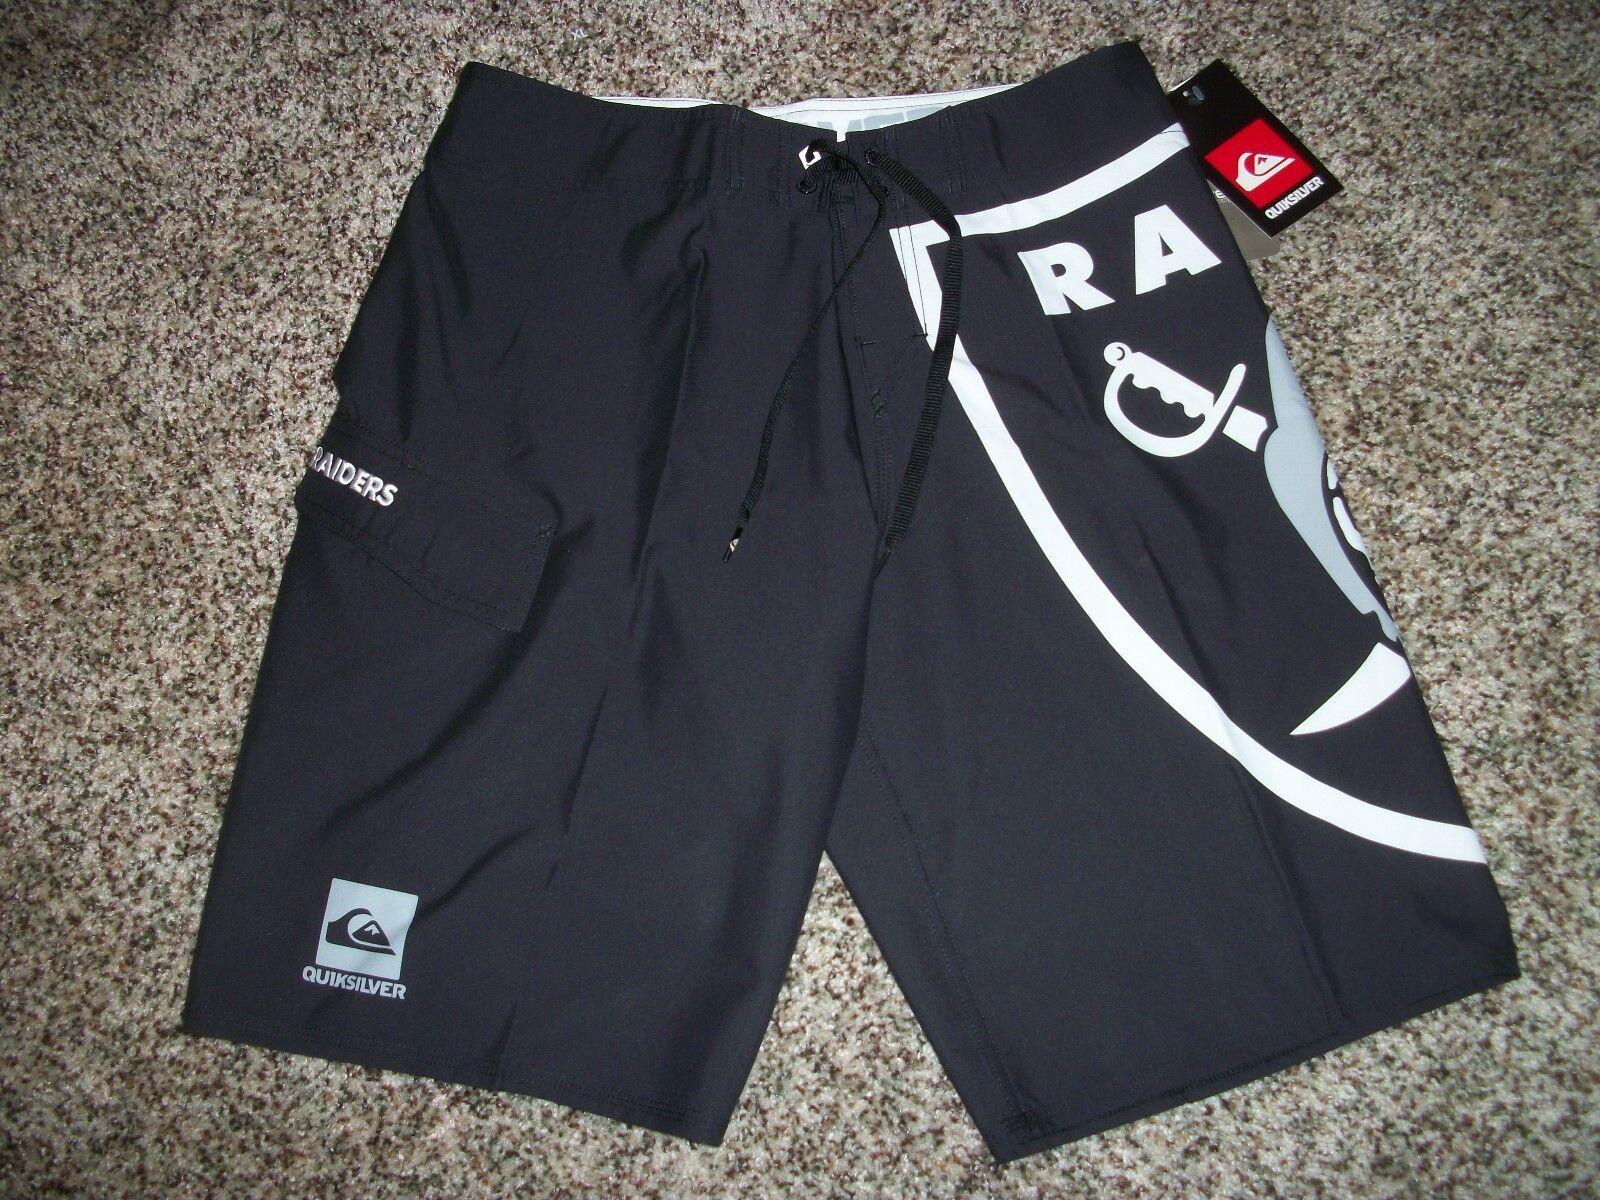 c2381bc90da Mens Quiksilver Oakland Raiders Boardshorts Board Drawstring Small ...